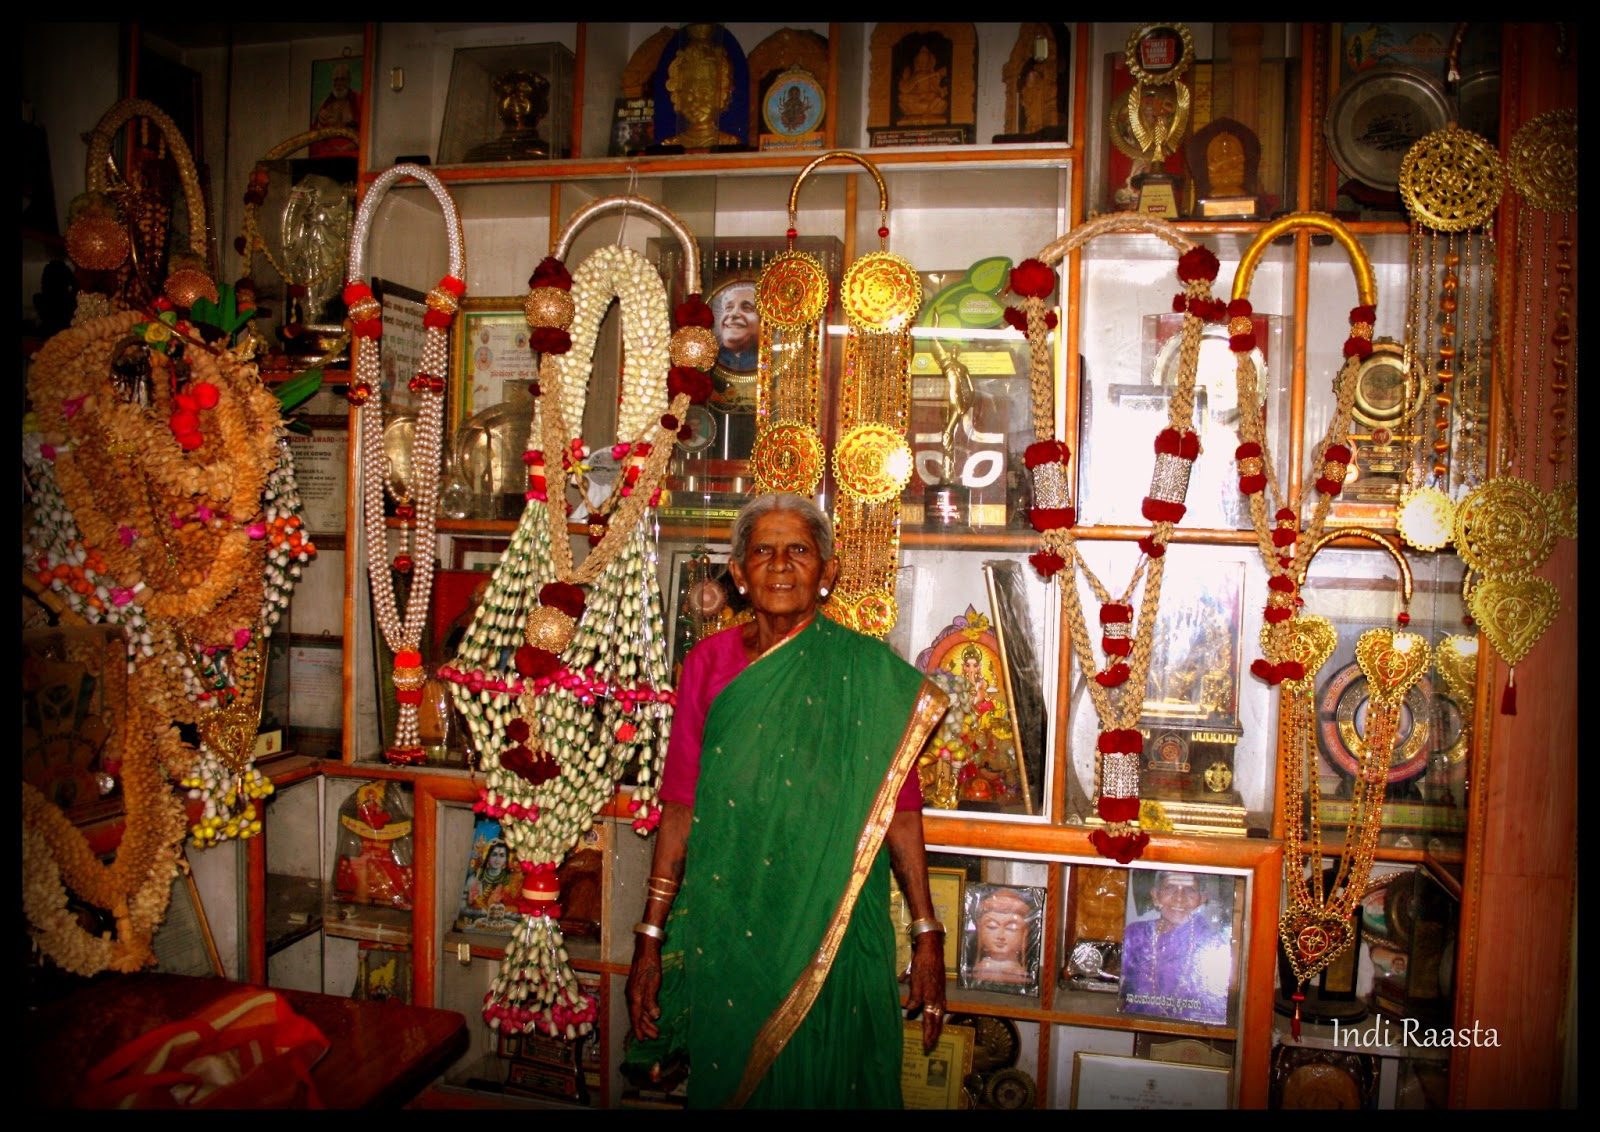 indi raasta  salumarada thimmakka  at the age of 101  she